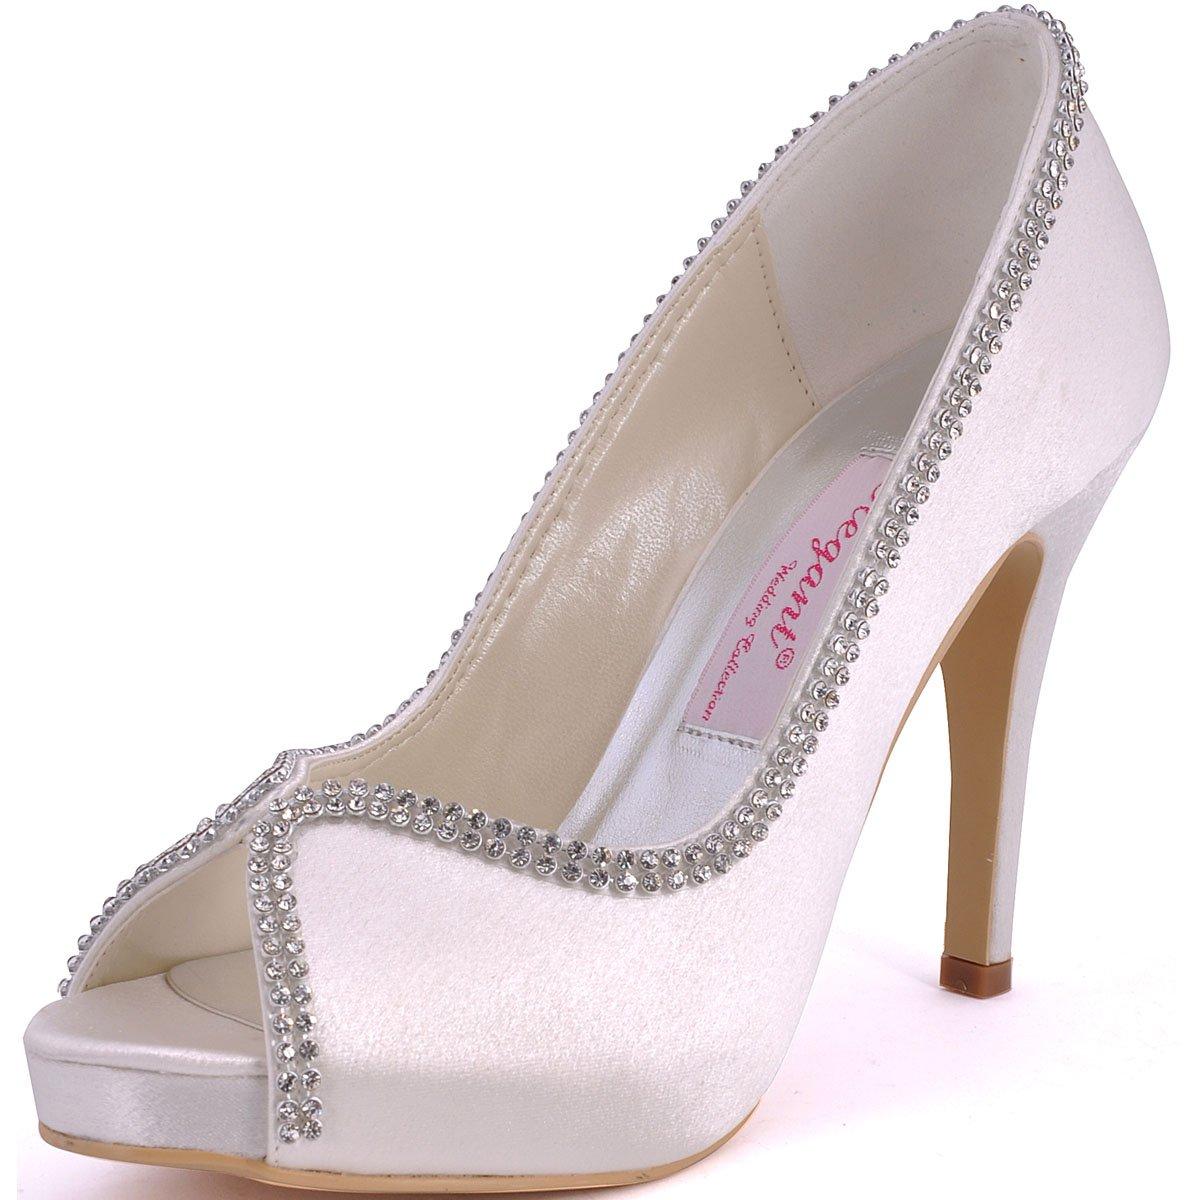 ElegantPark EP11083 Women Pumps Peep Toe Rhinestones Platform High Heel Satin Wedding Bridal Shoes Ivory US 9